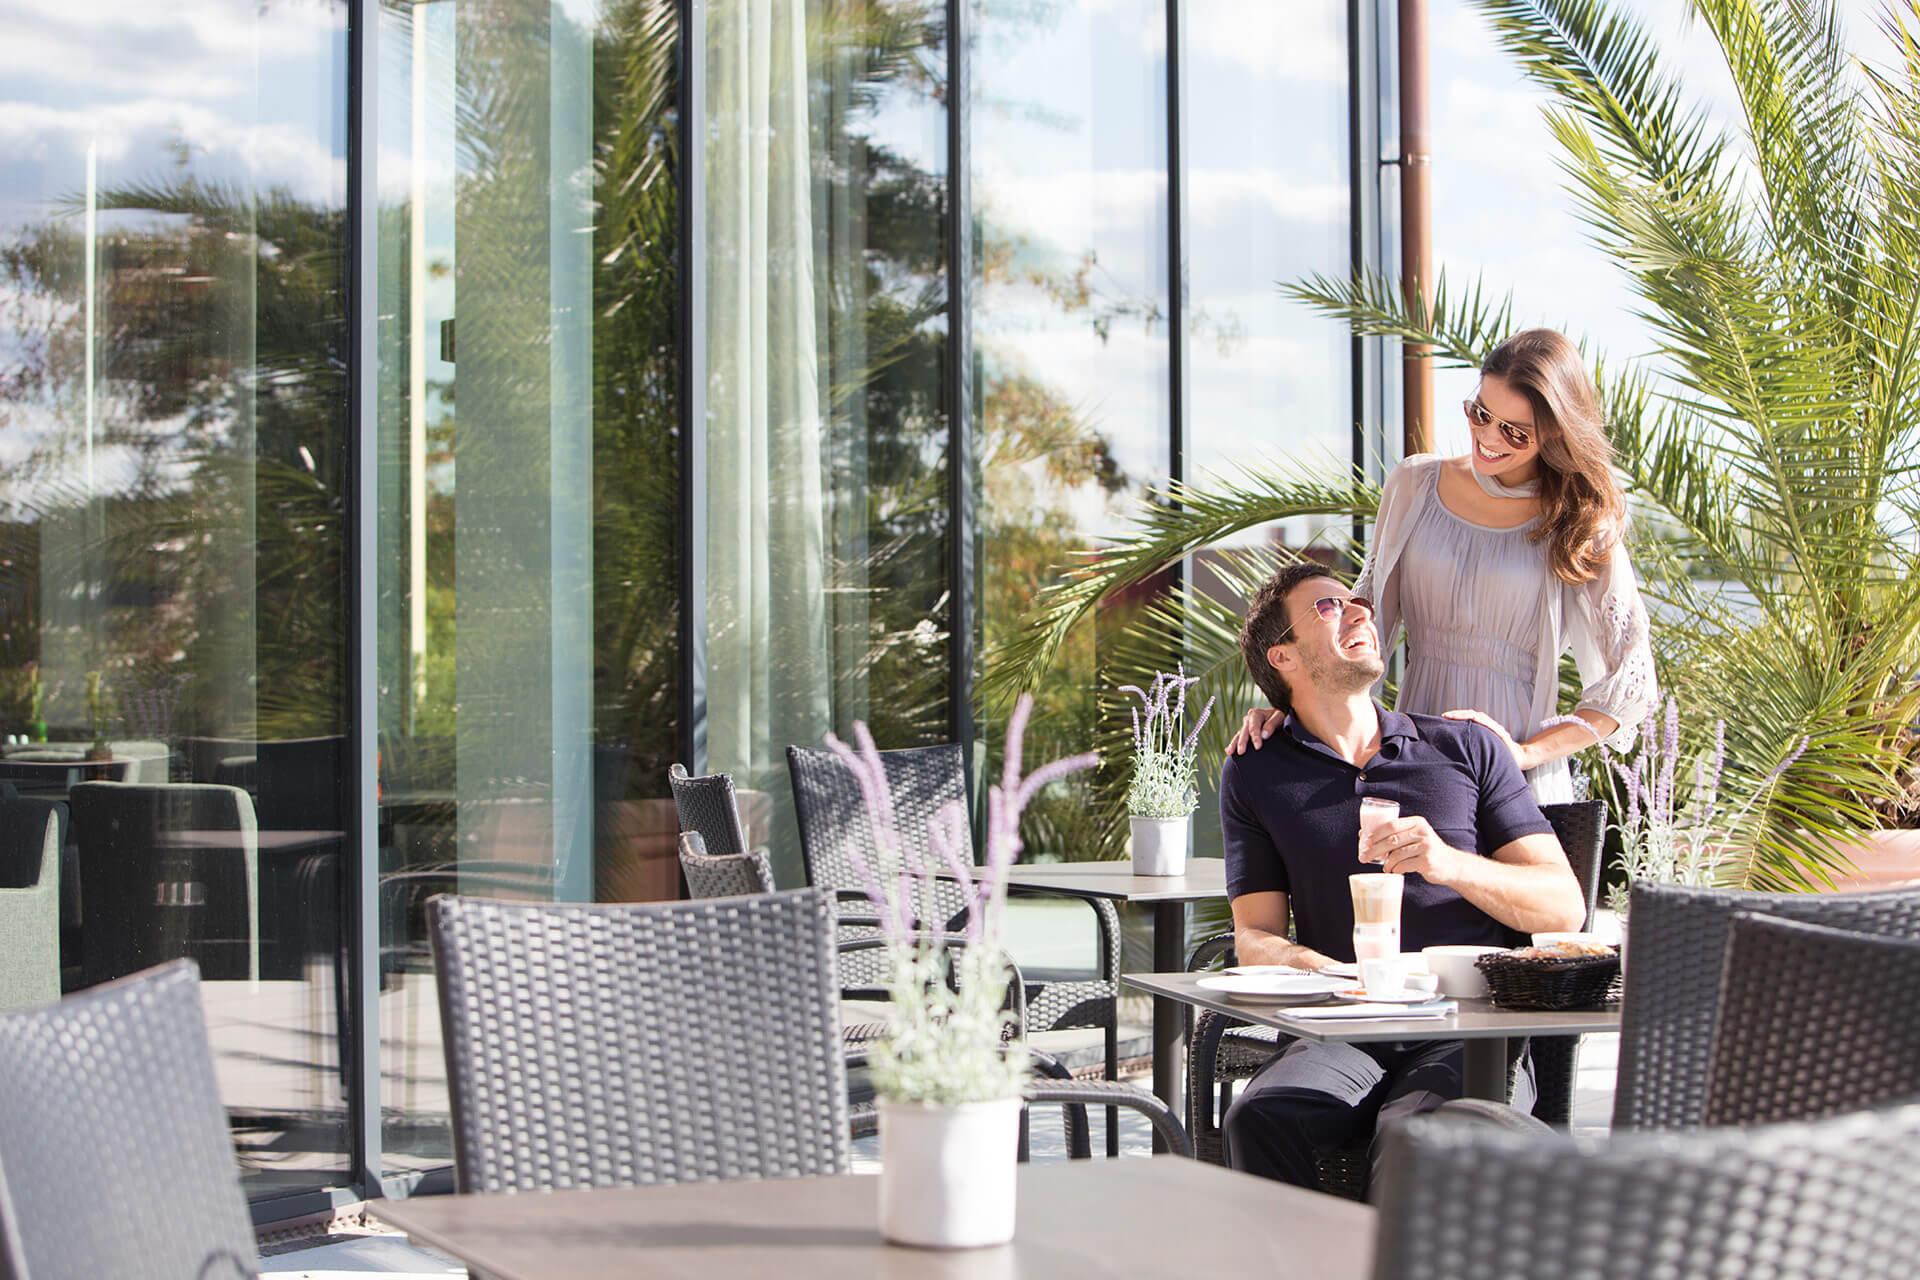 wellnesshotel frankfurt hotel hofheim an der rhein main therme. Black Bedroom Furniture Sets. Home Design Ideas